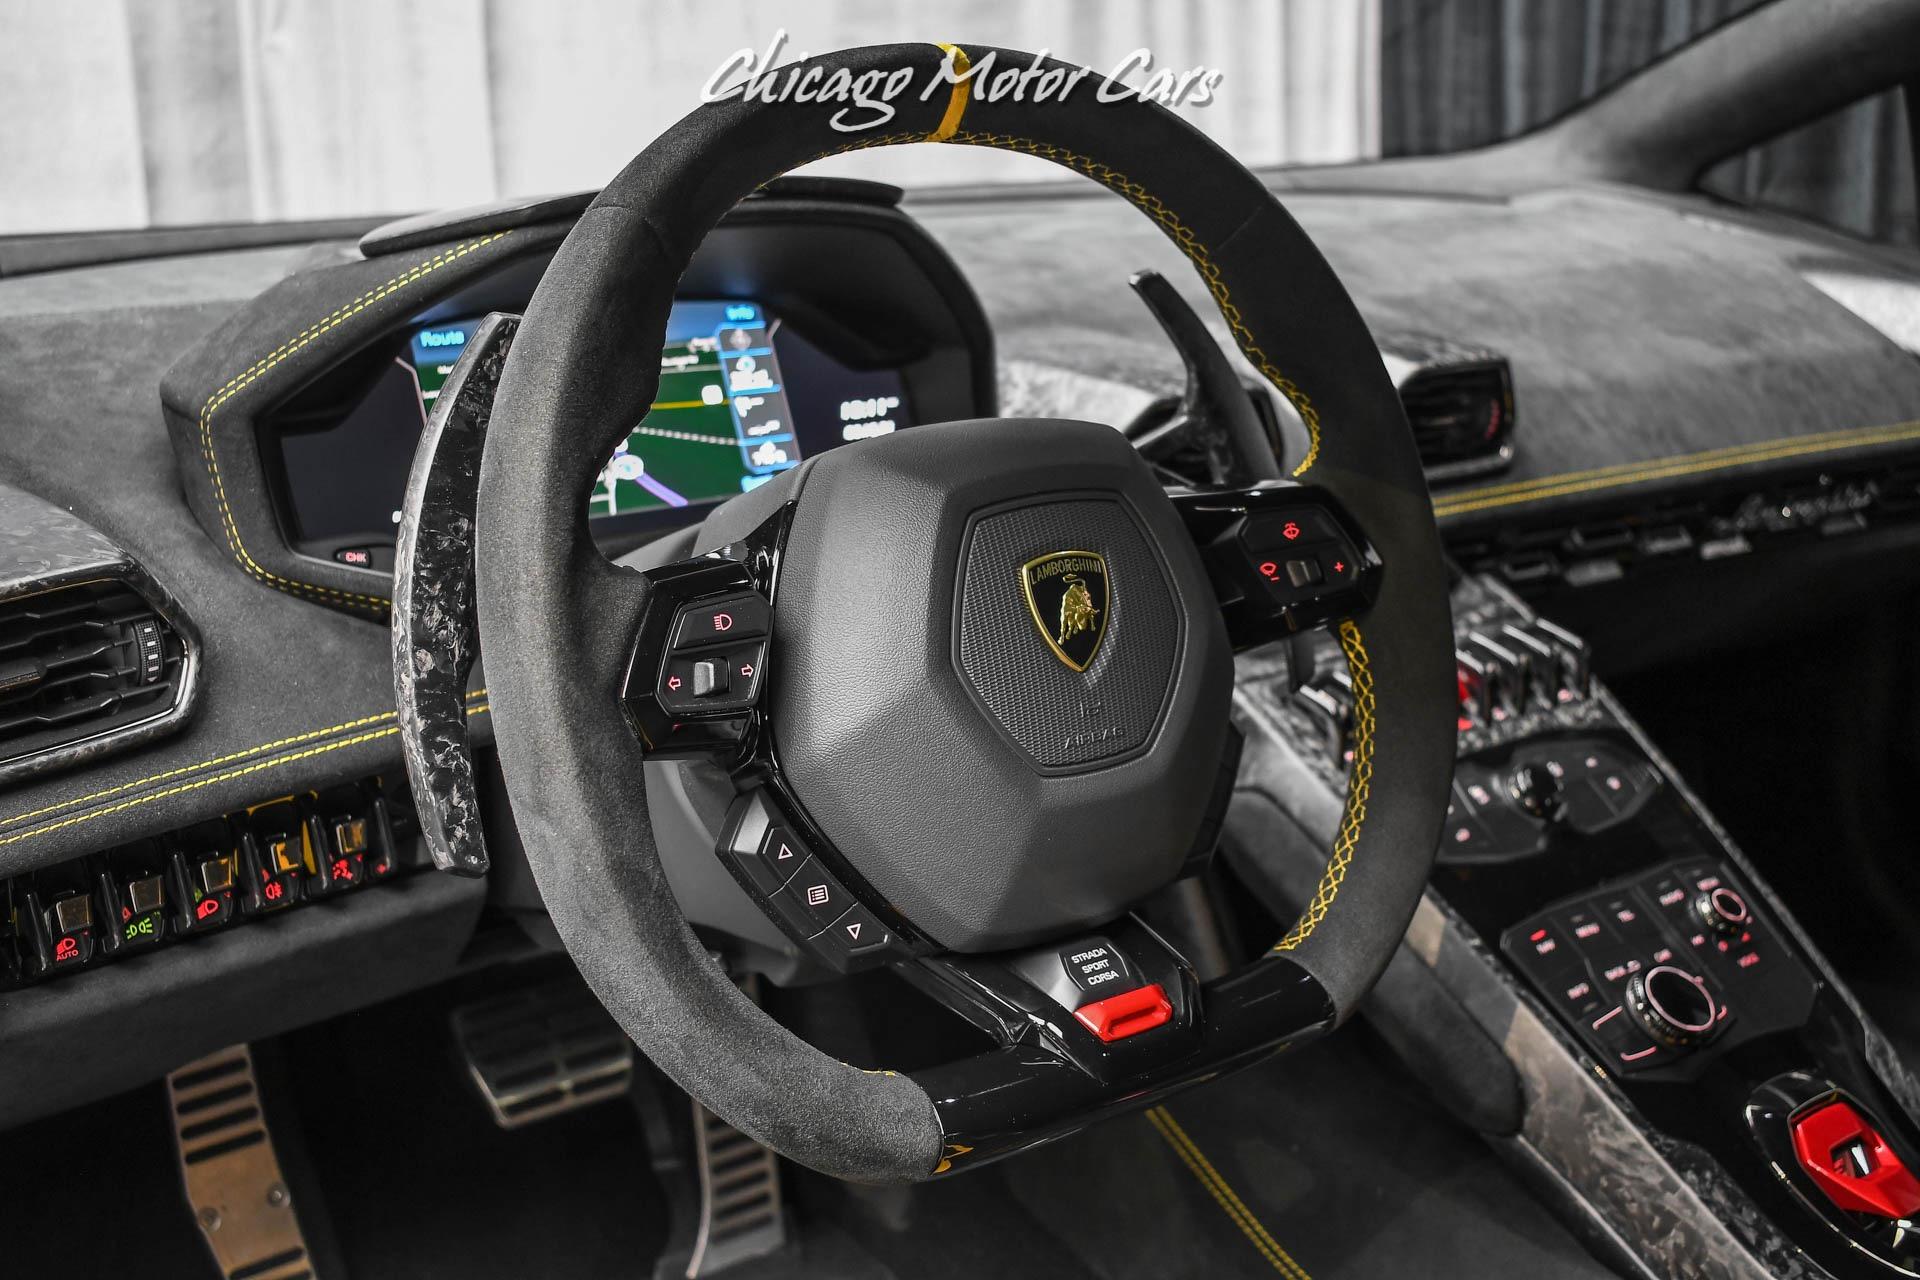 Used-2018-Lamborghini-Huracan-LP640-4-Performante-Only-1450-Miles-RARE-1of1-Matte-Viola-30th-SE-Loaded